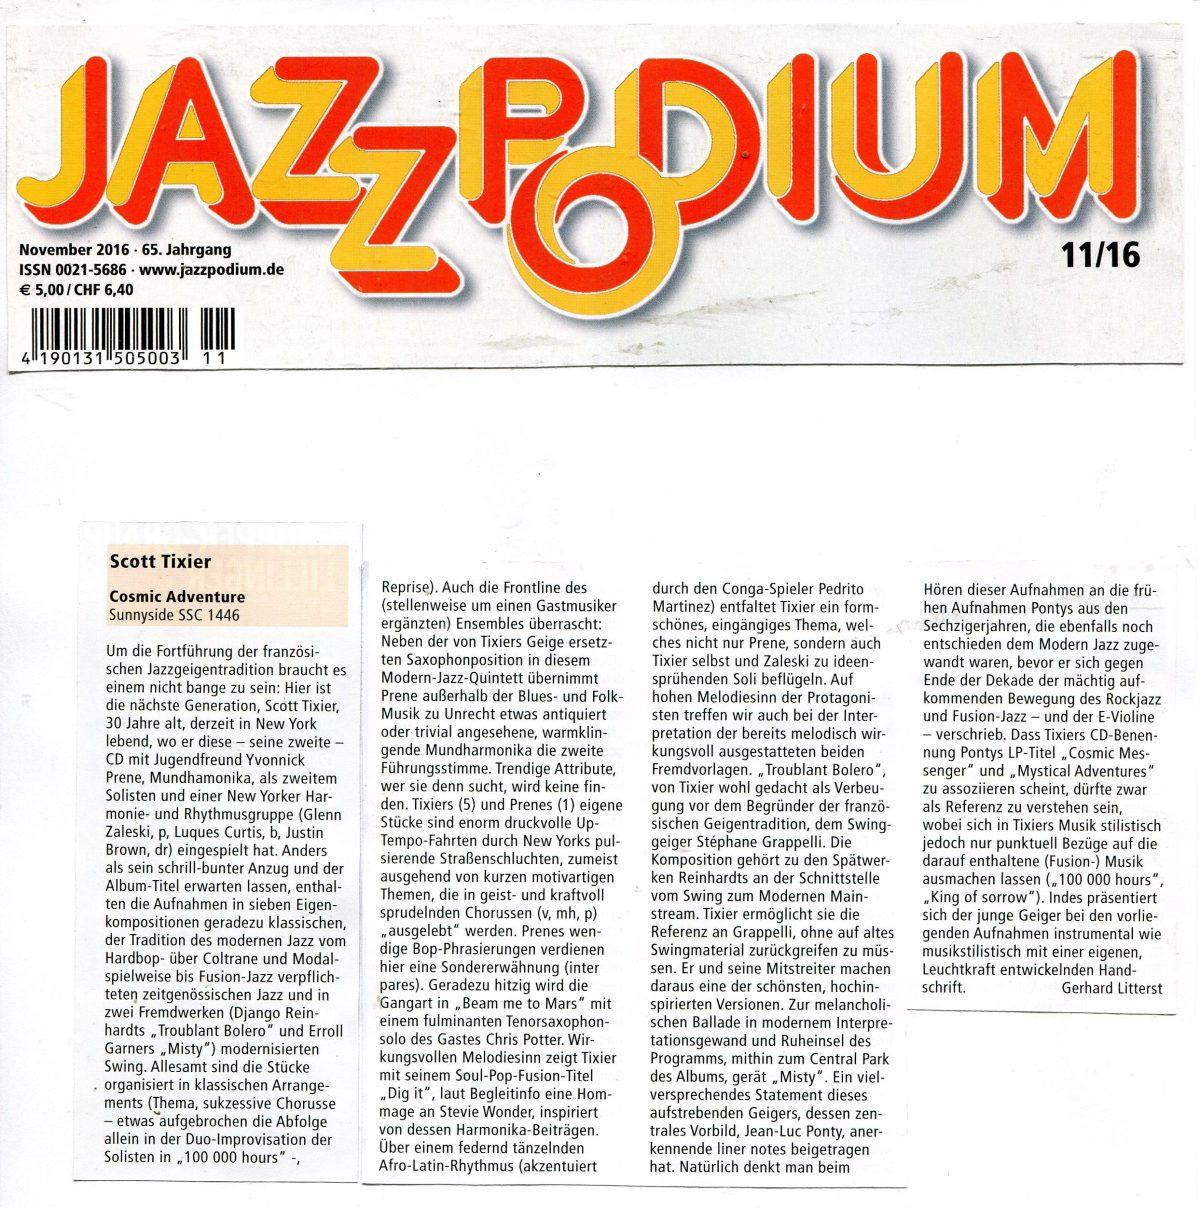 scotttixier_jazzpodium